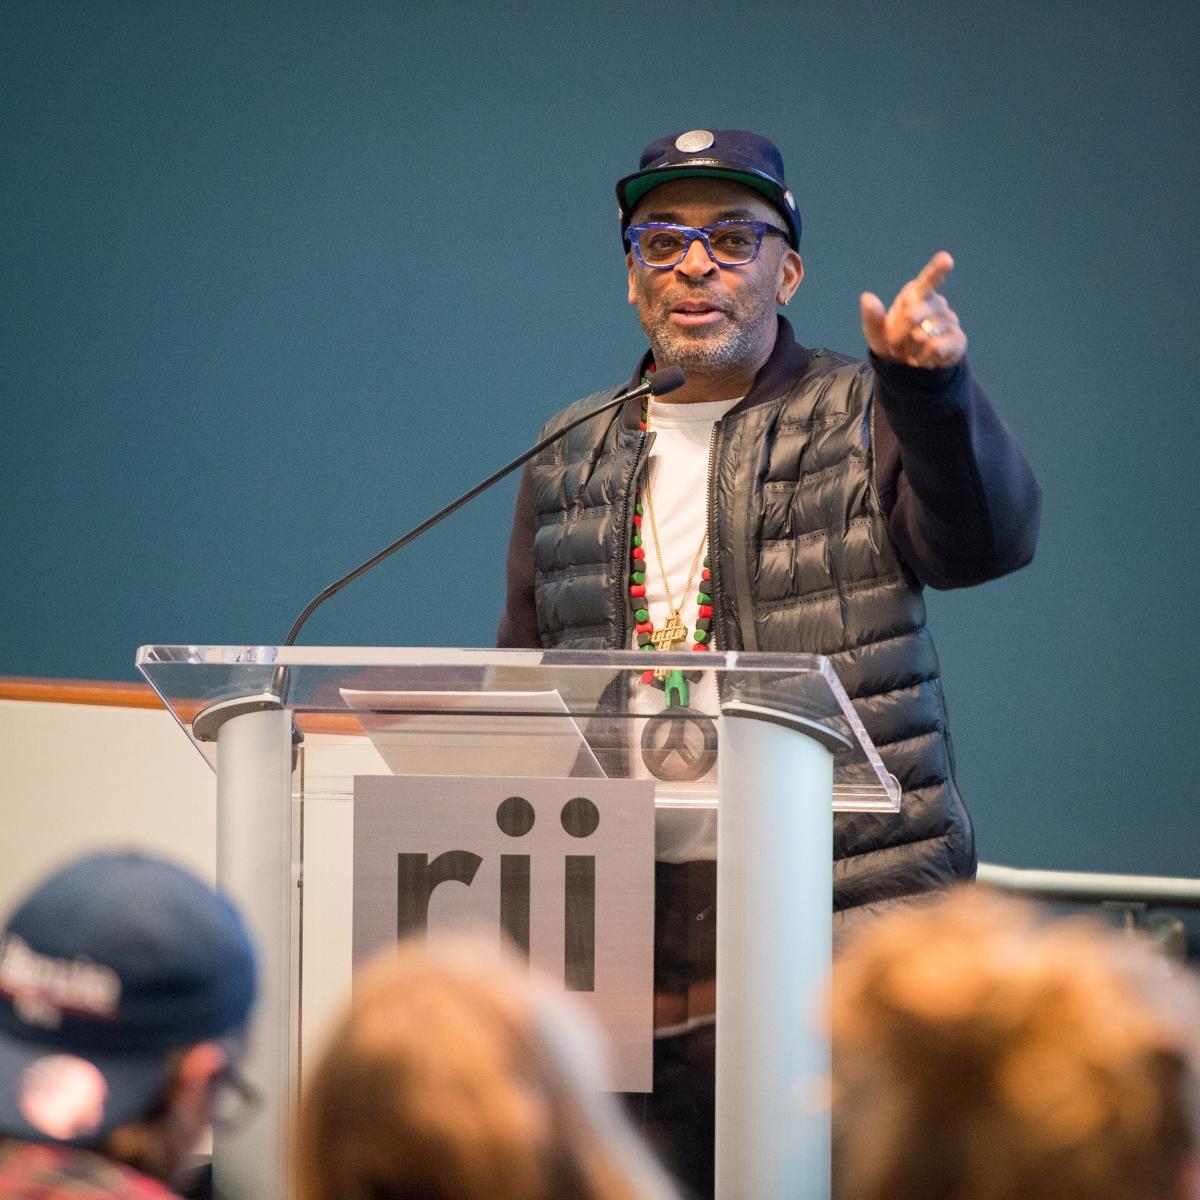 Filmmaker Spike Lee. University of Missouri School of Journalism.